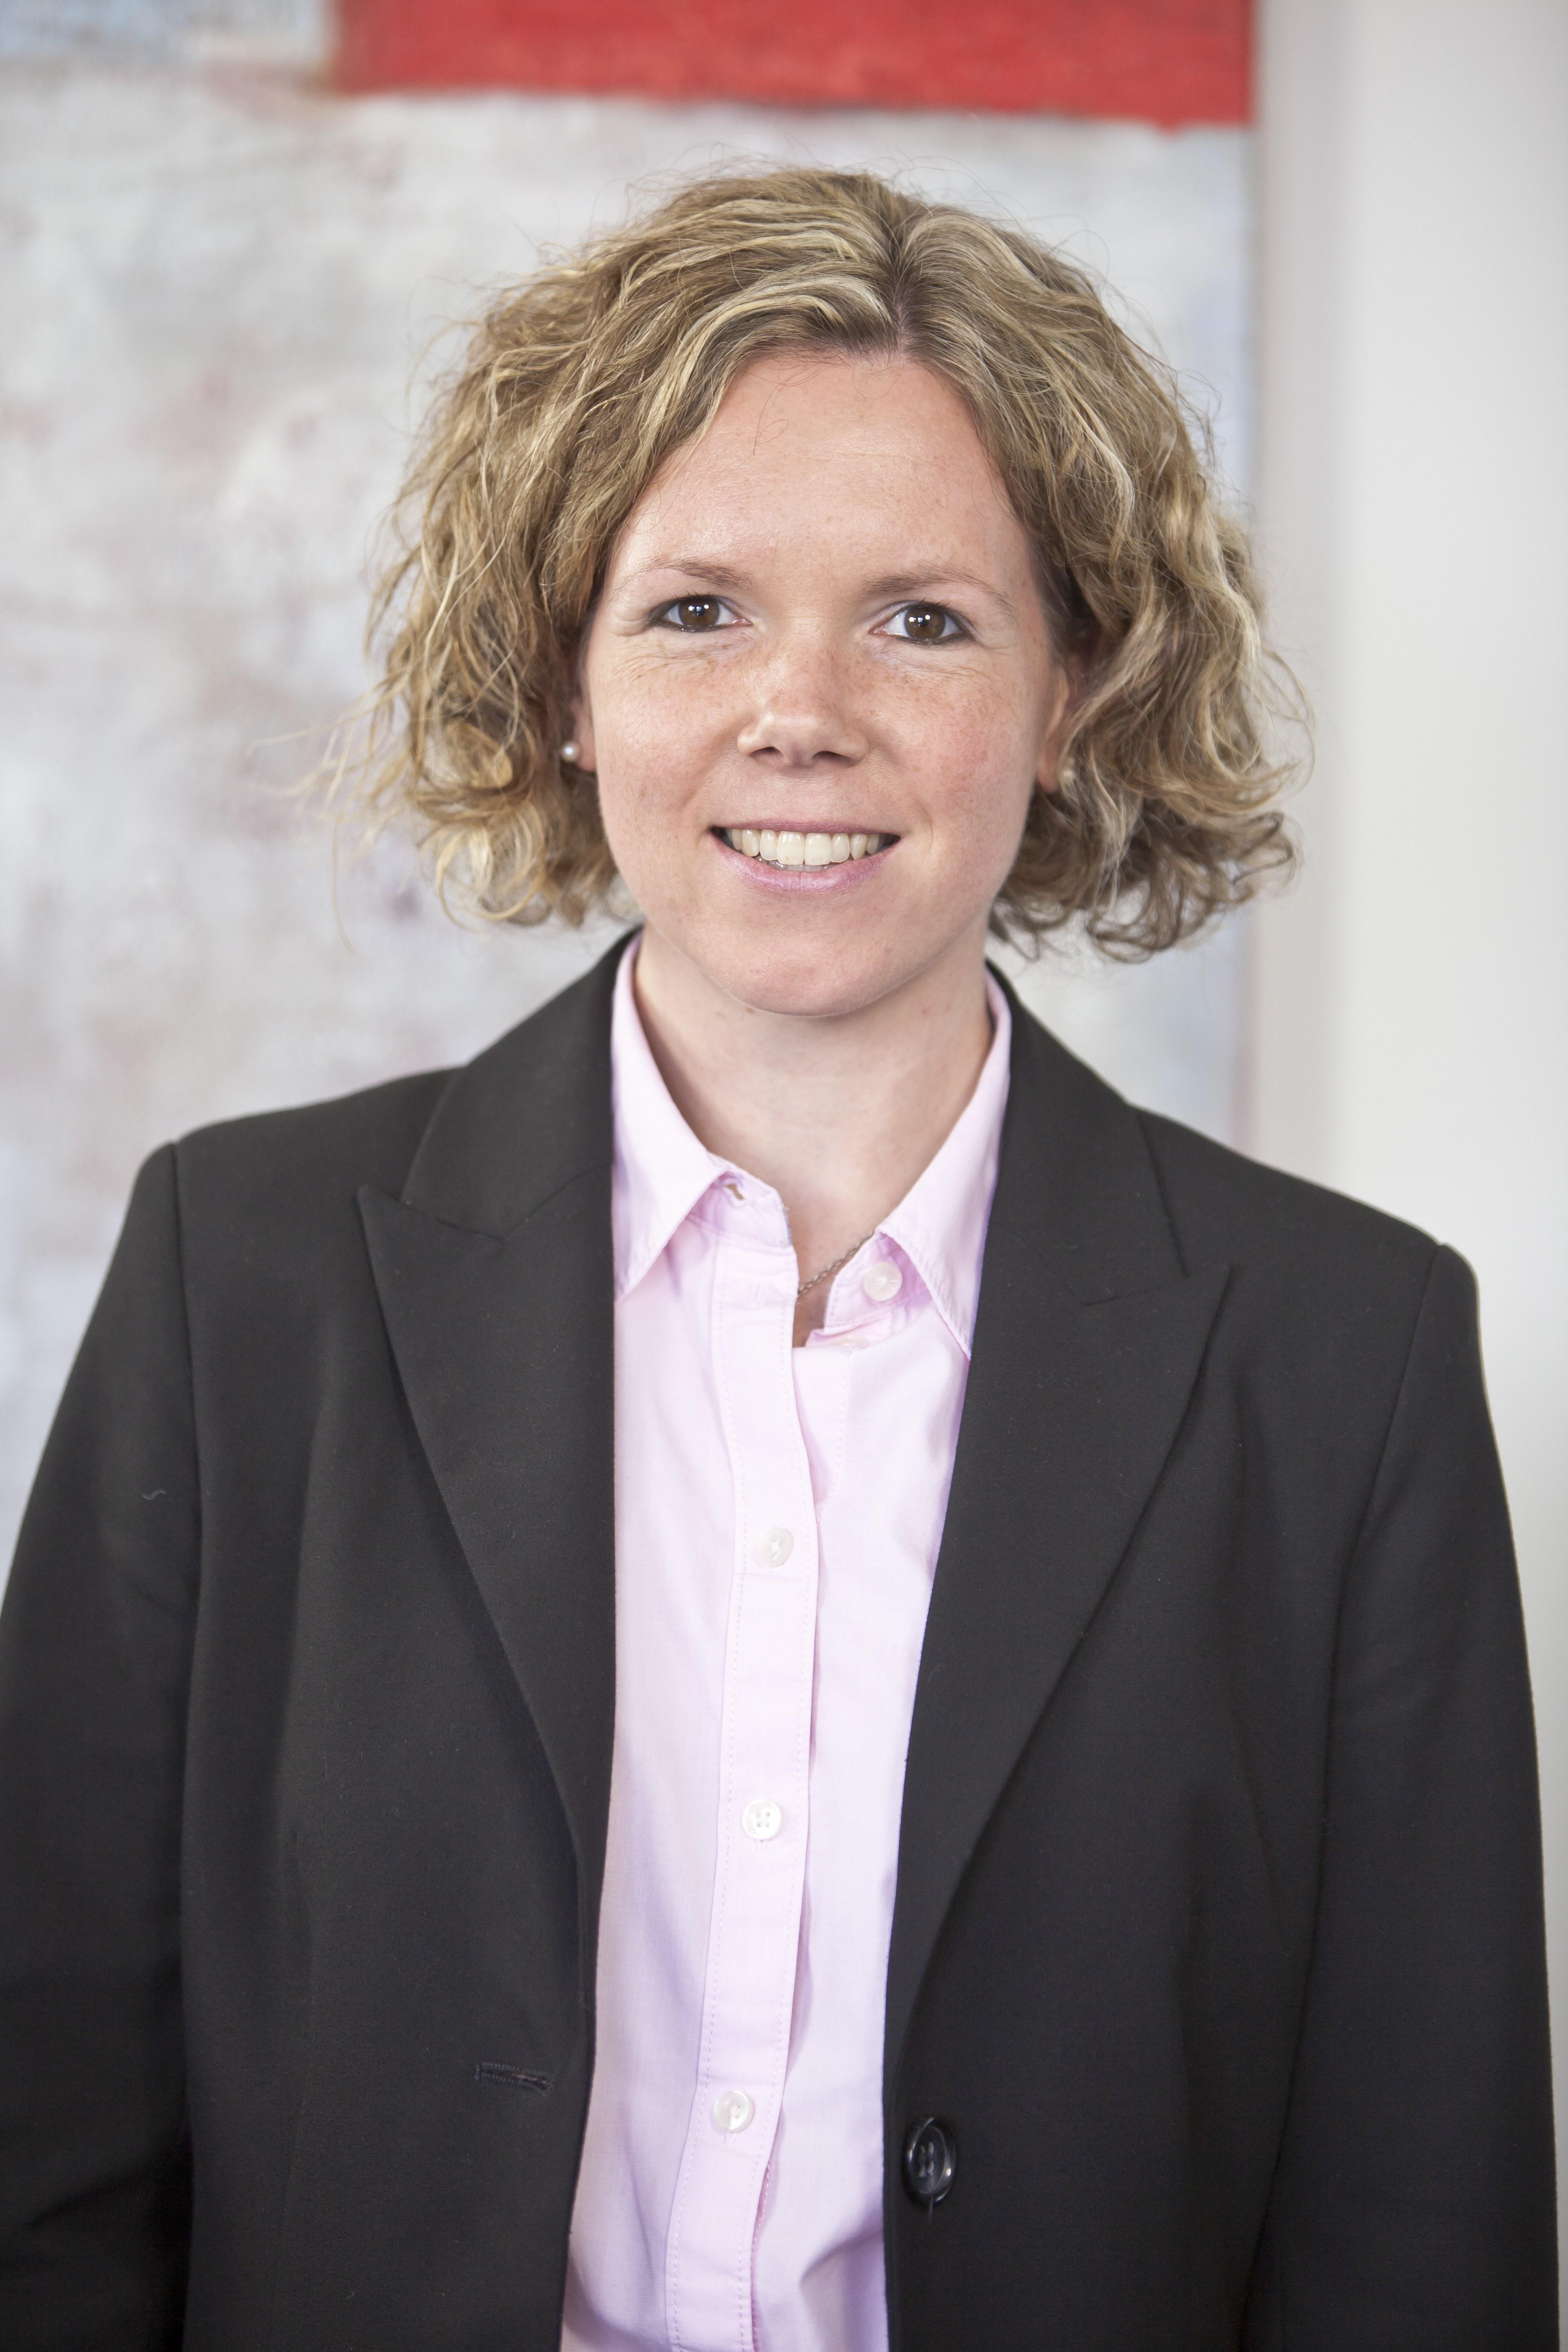 Simone Verwold